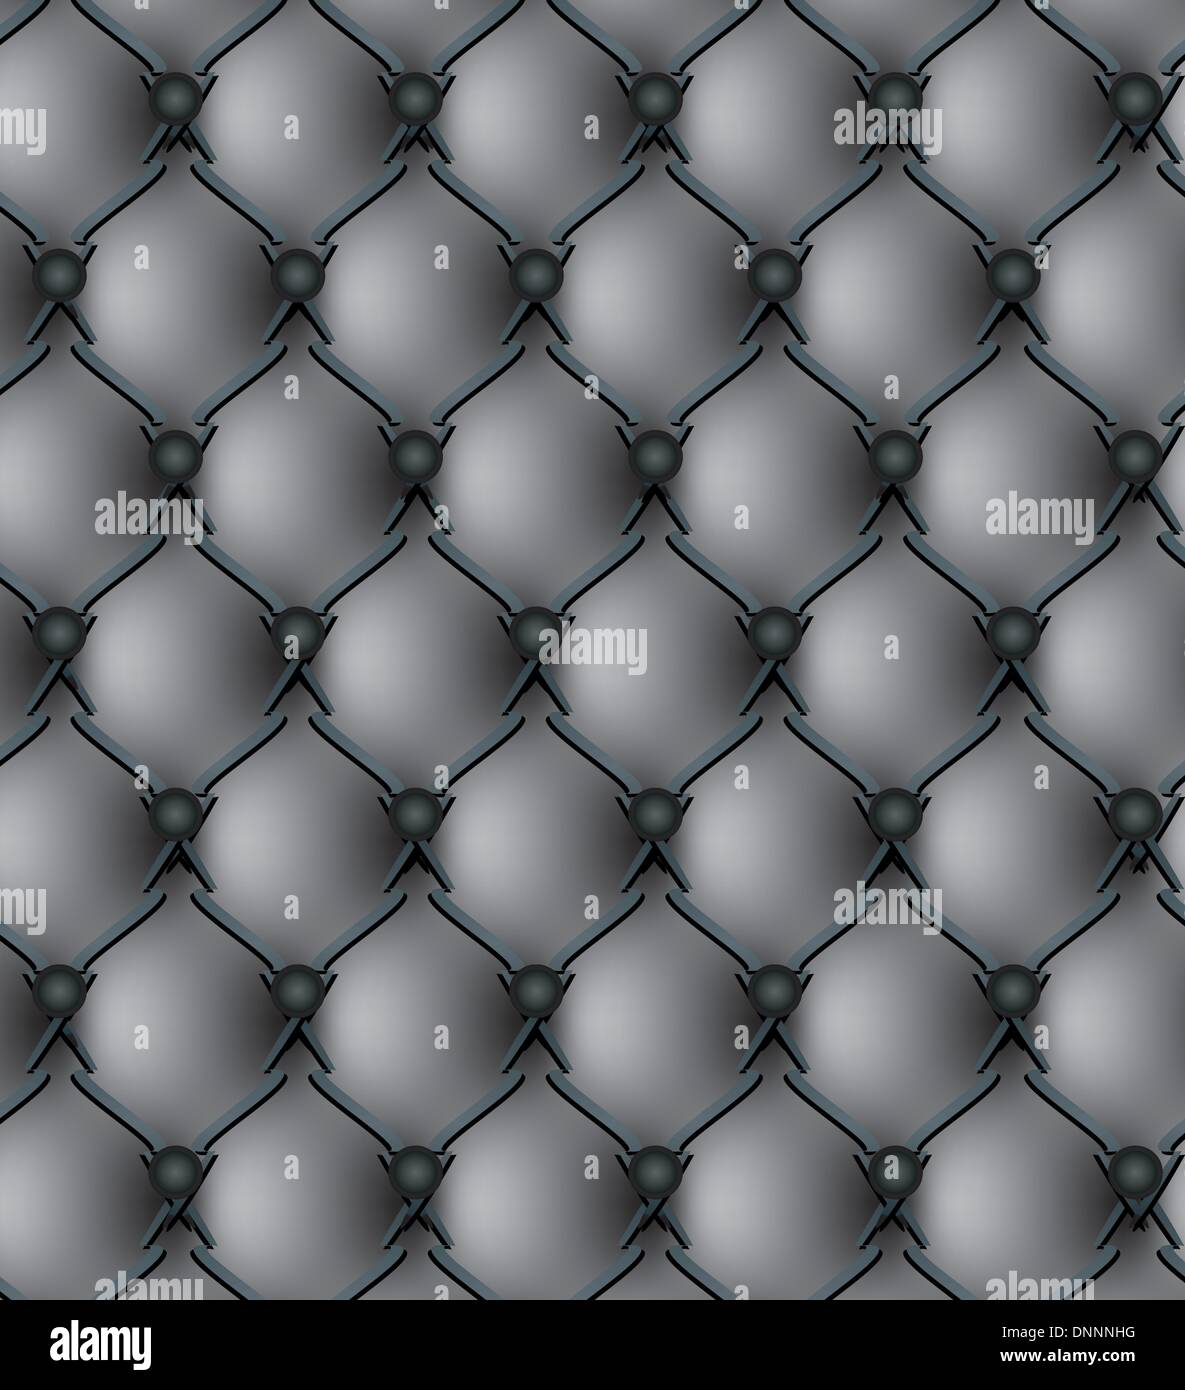 Black genuine leather upholstery pattern vector illustration - Stock Image